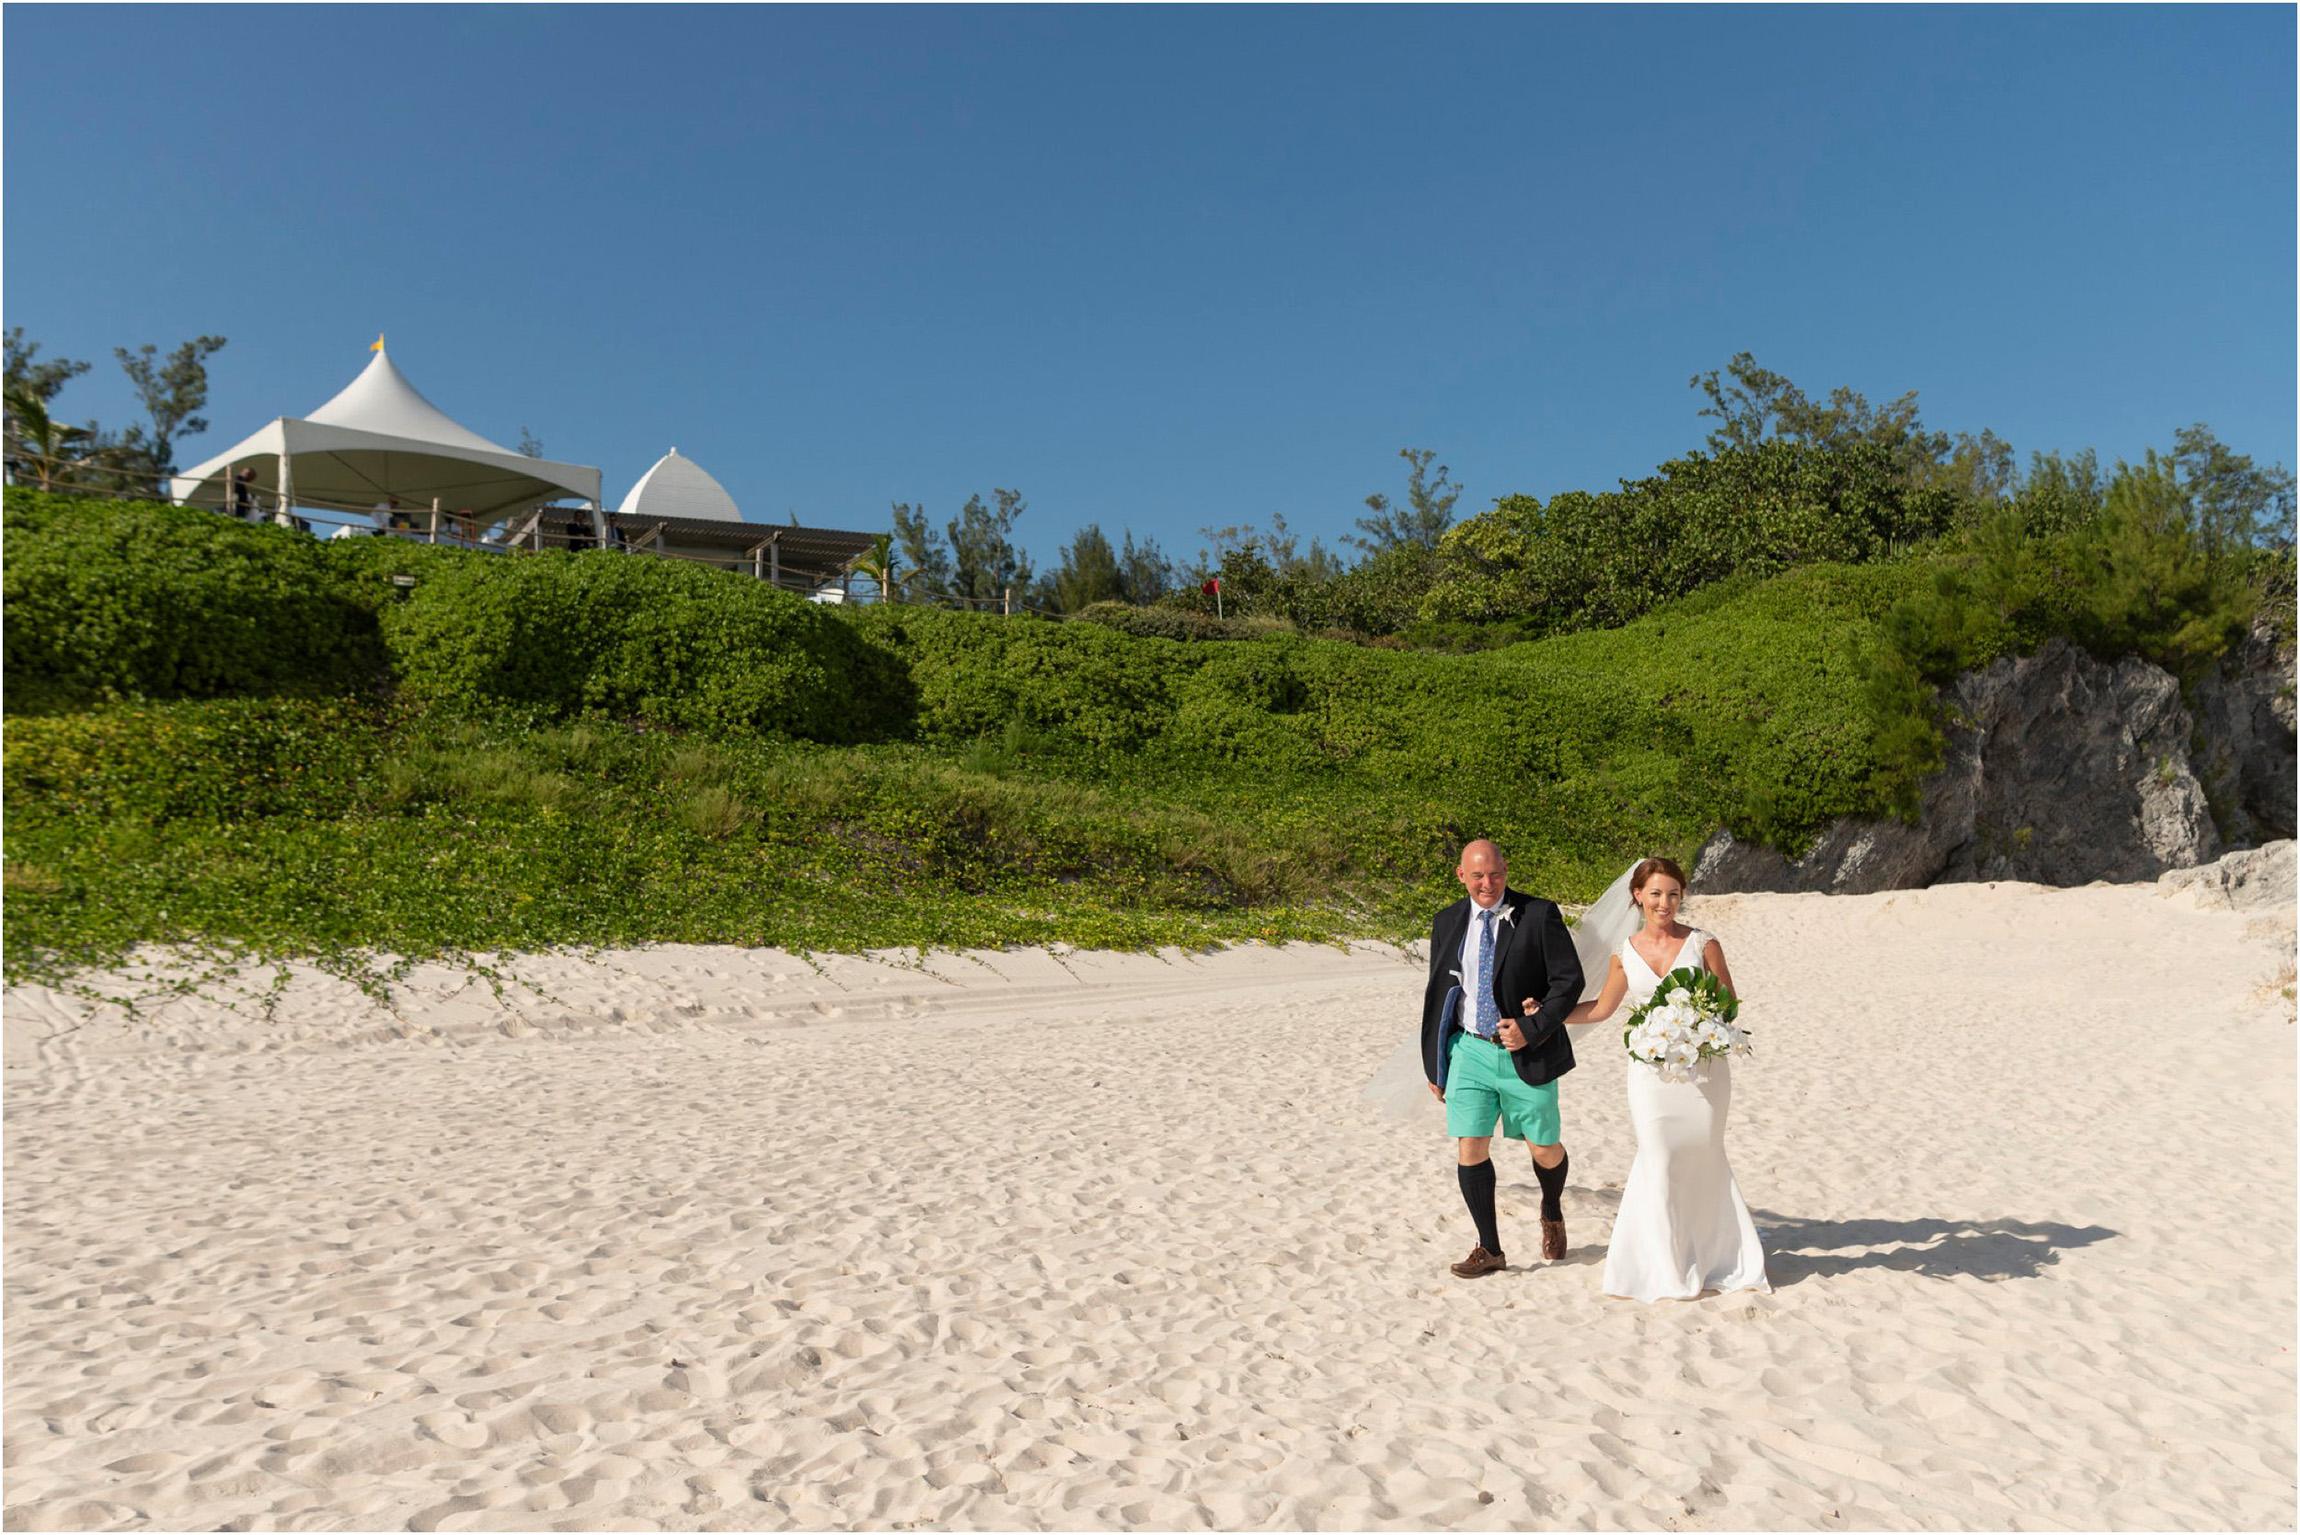 ©FianderFoto_Bermuda Wedding Photographer_Mid Ocean_Rachel_Angus_018.jpg